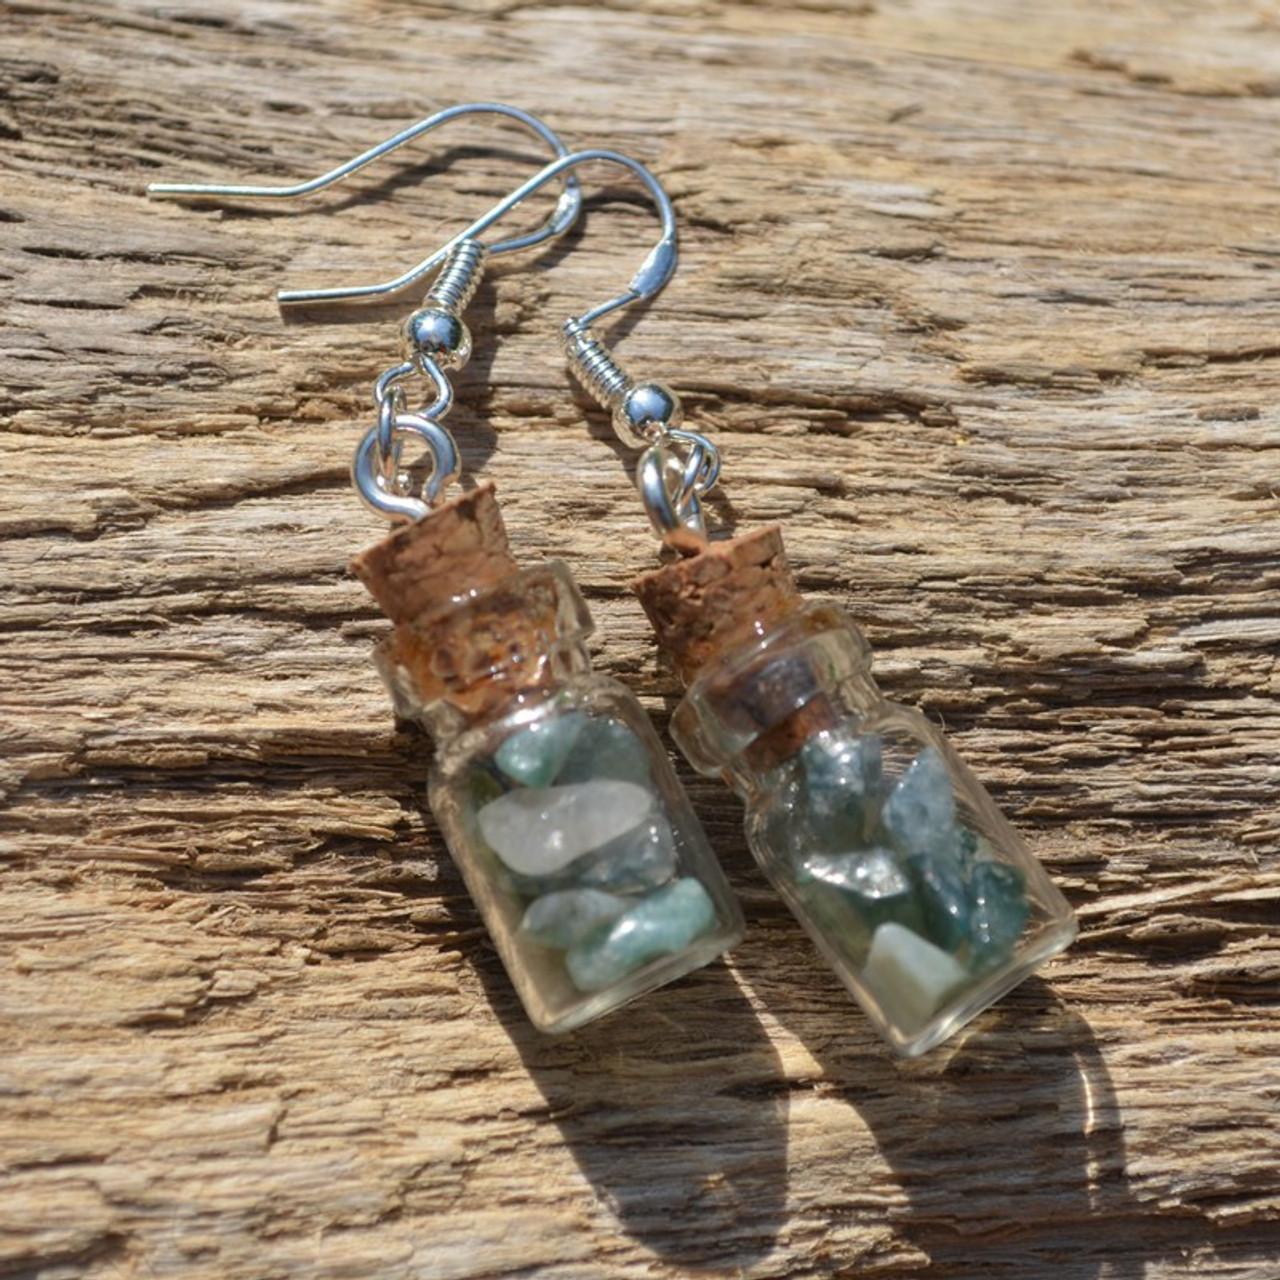 Green Moss Agate Stones in Delicate Glass Vial Earrings